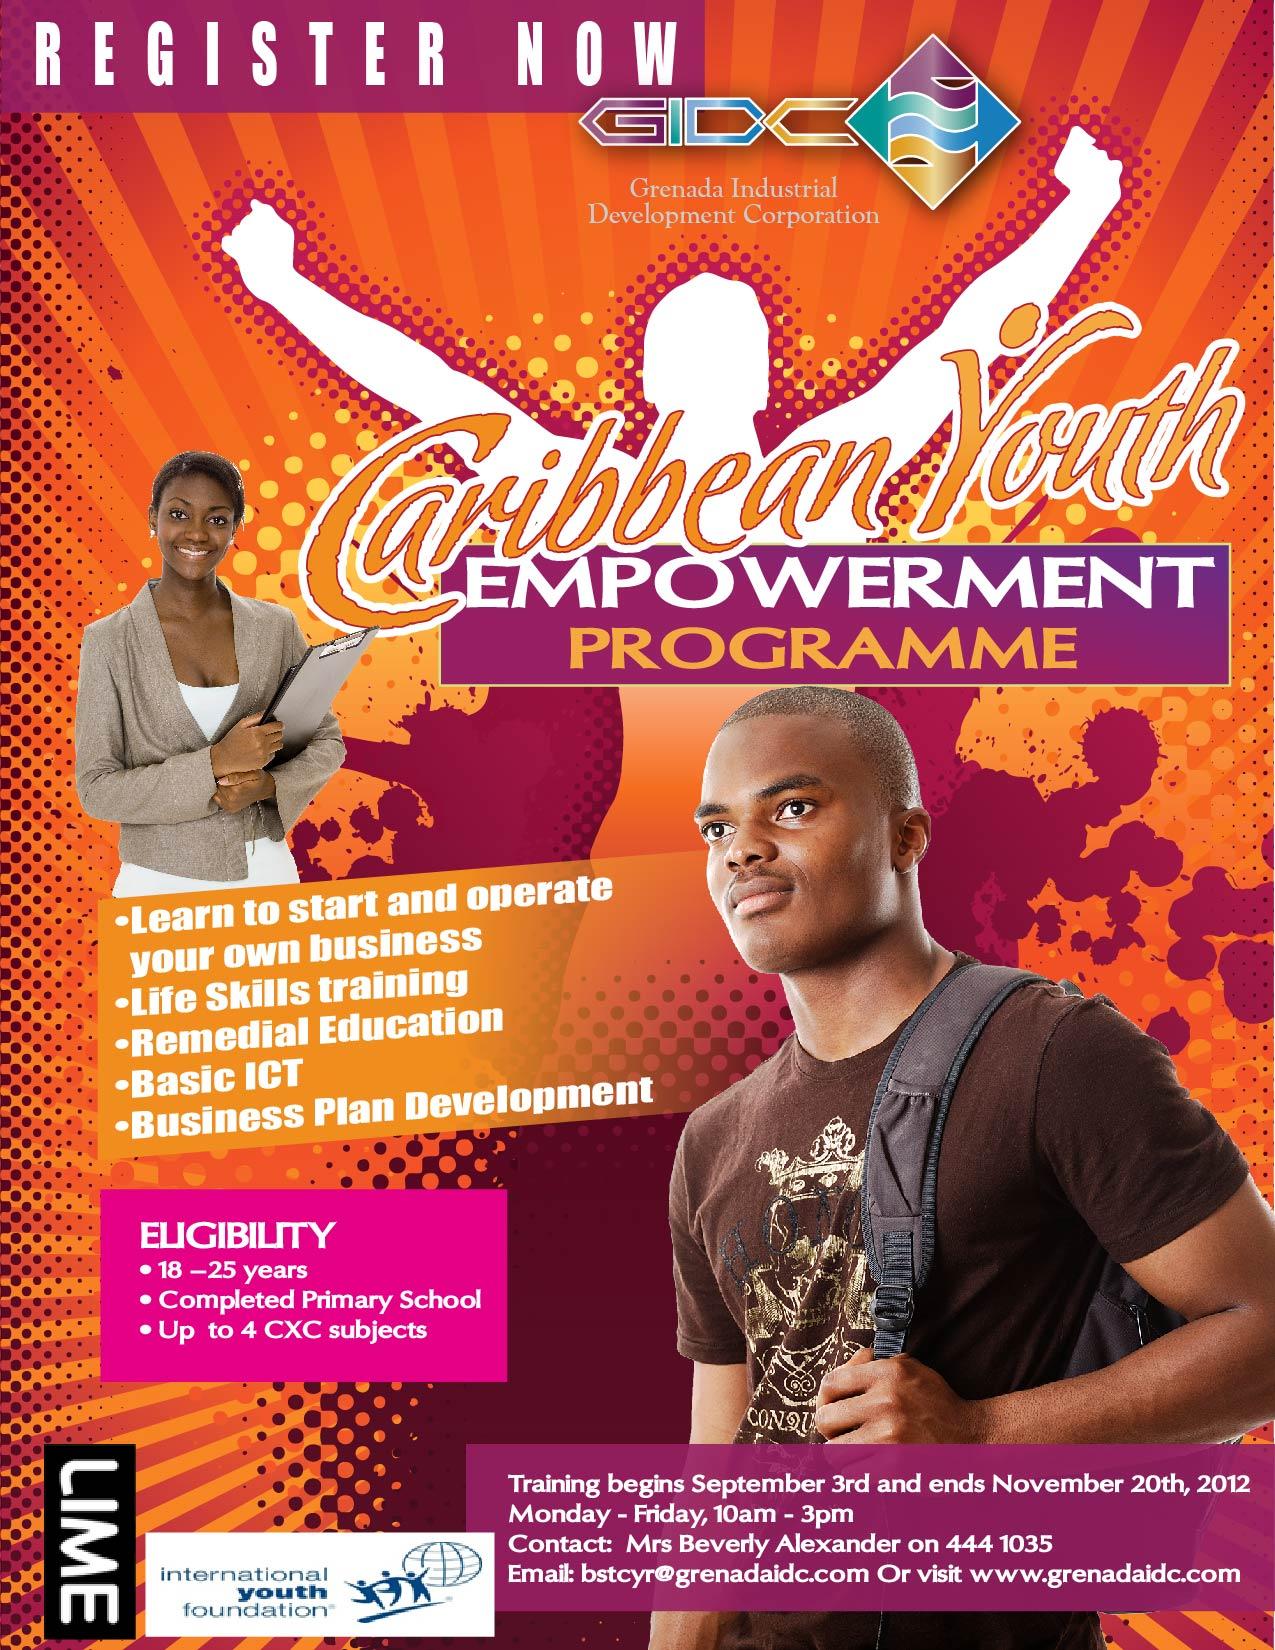 caribbean youth empowerment programme  u2013 groundation grenada